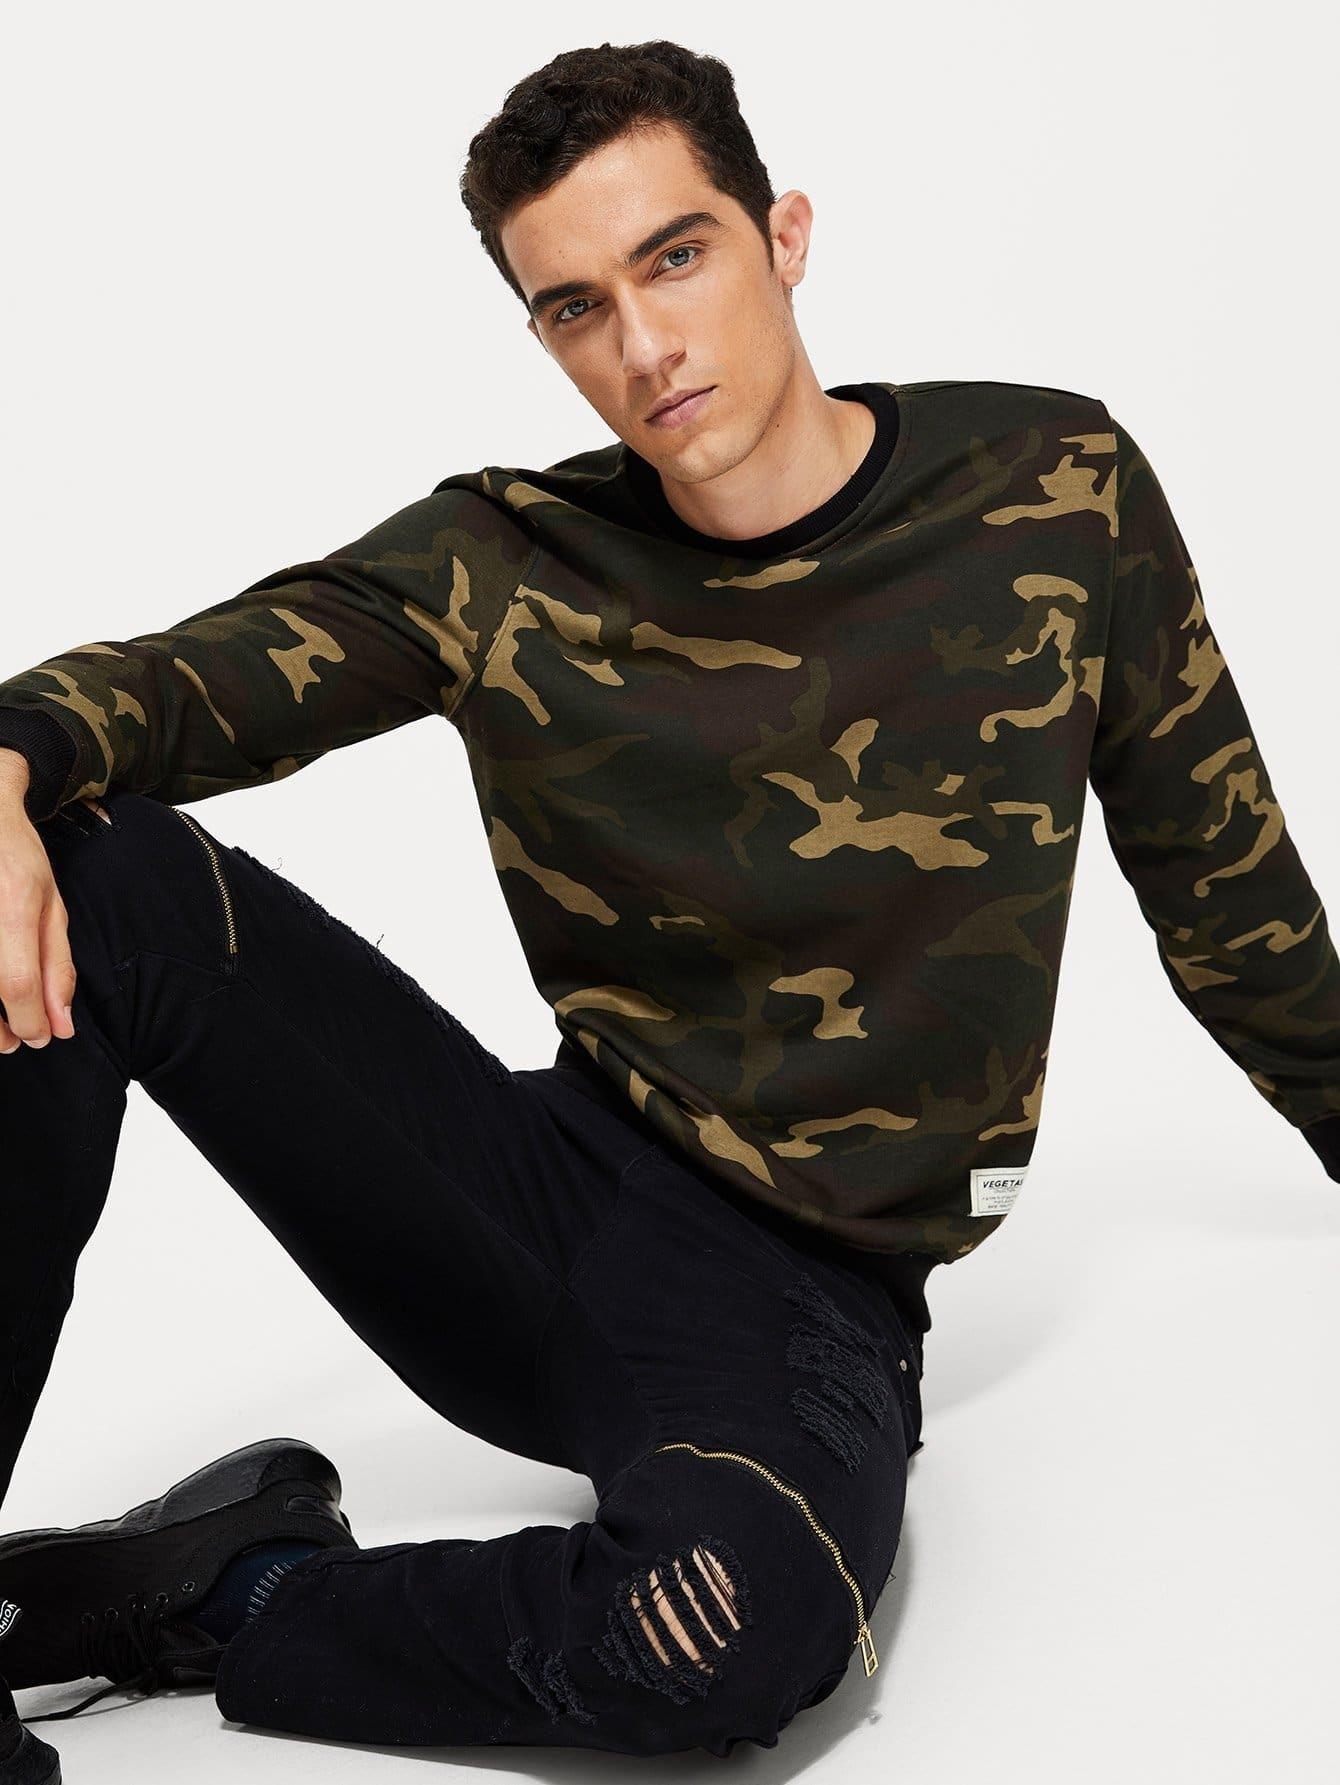 Men Camo Print Sweatshirts roamer часы roamer 941 637 41 53 90 коллекция saturn